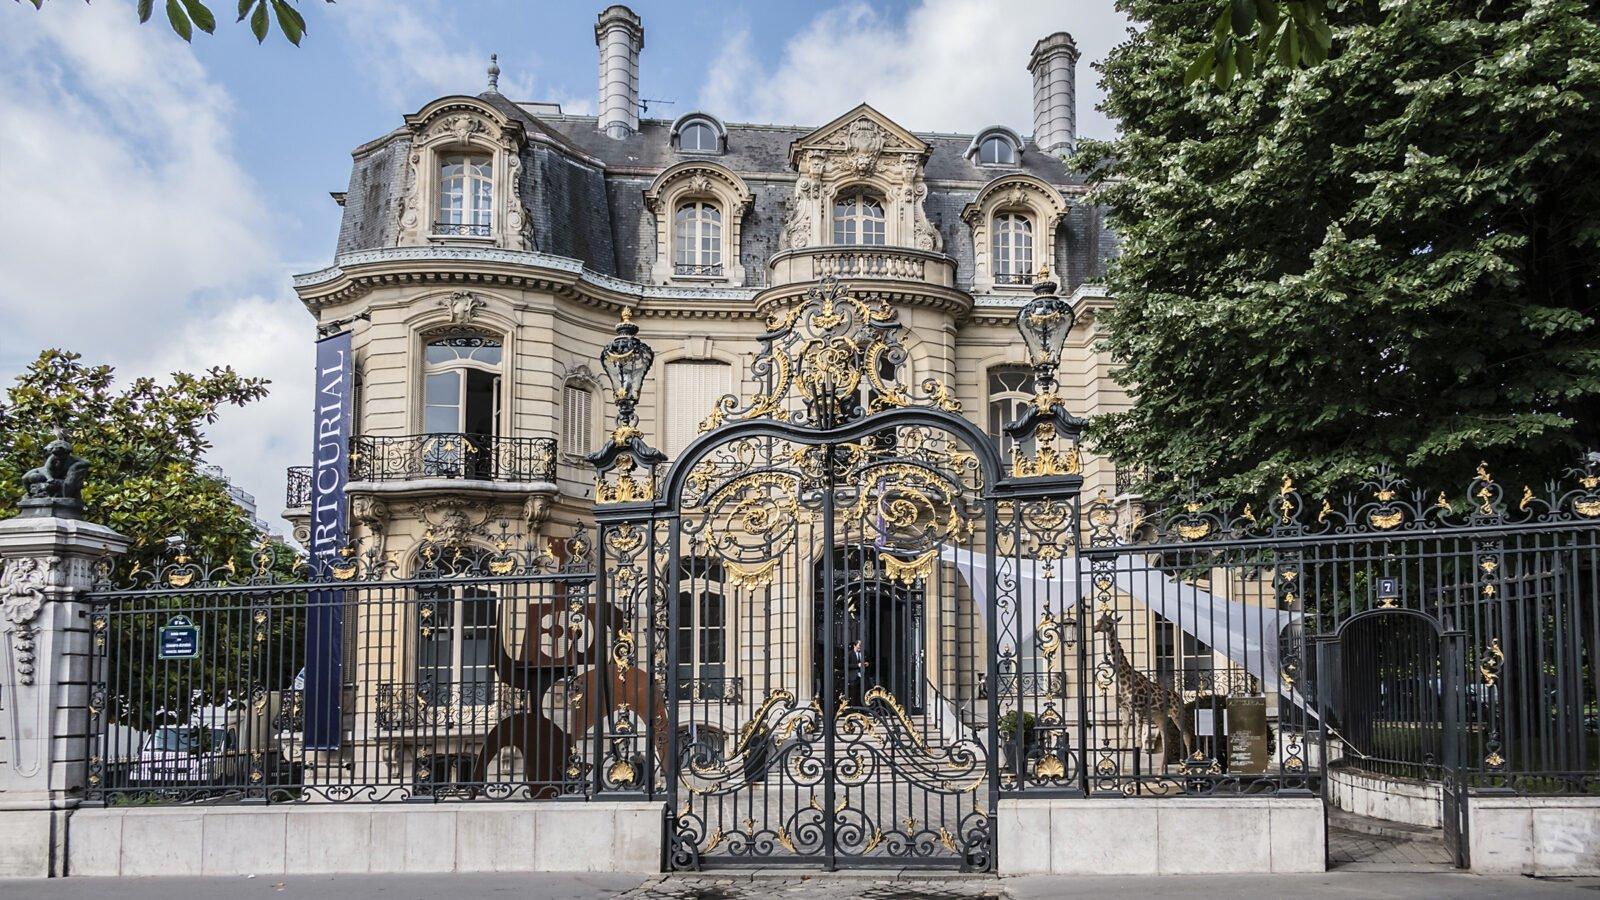 this image shows artcurial in paris, an auction house